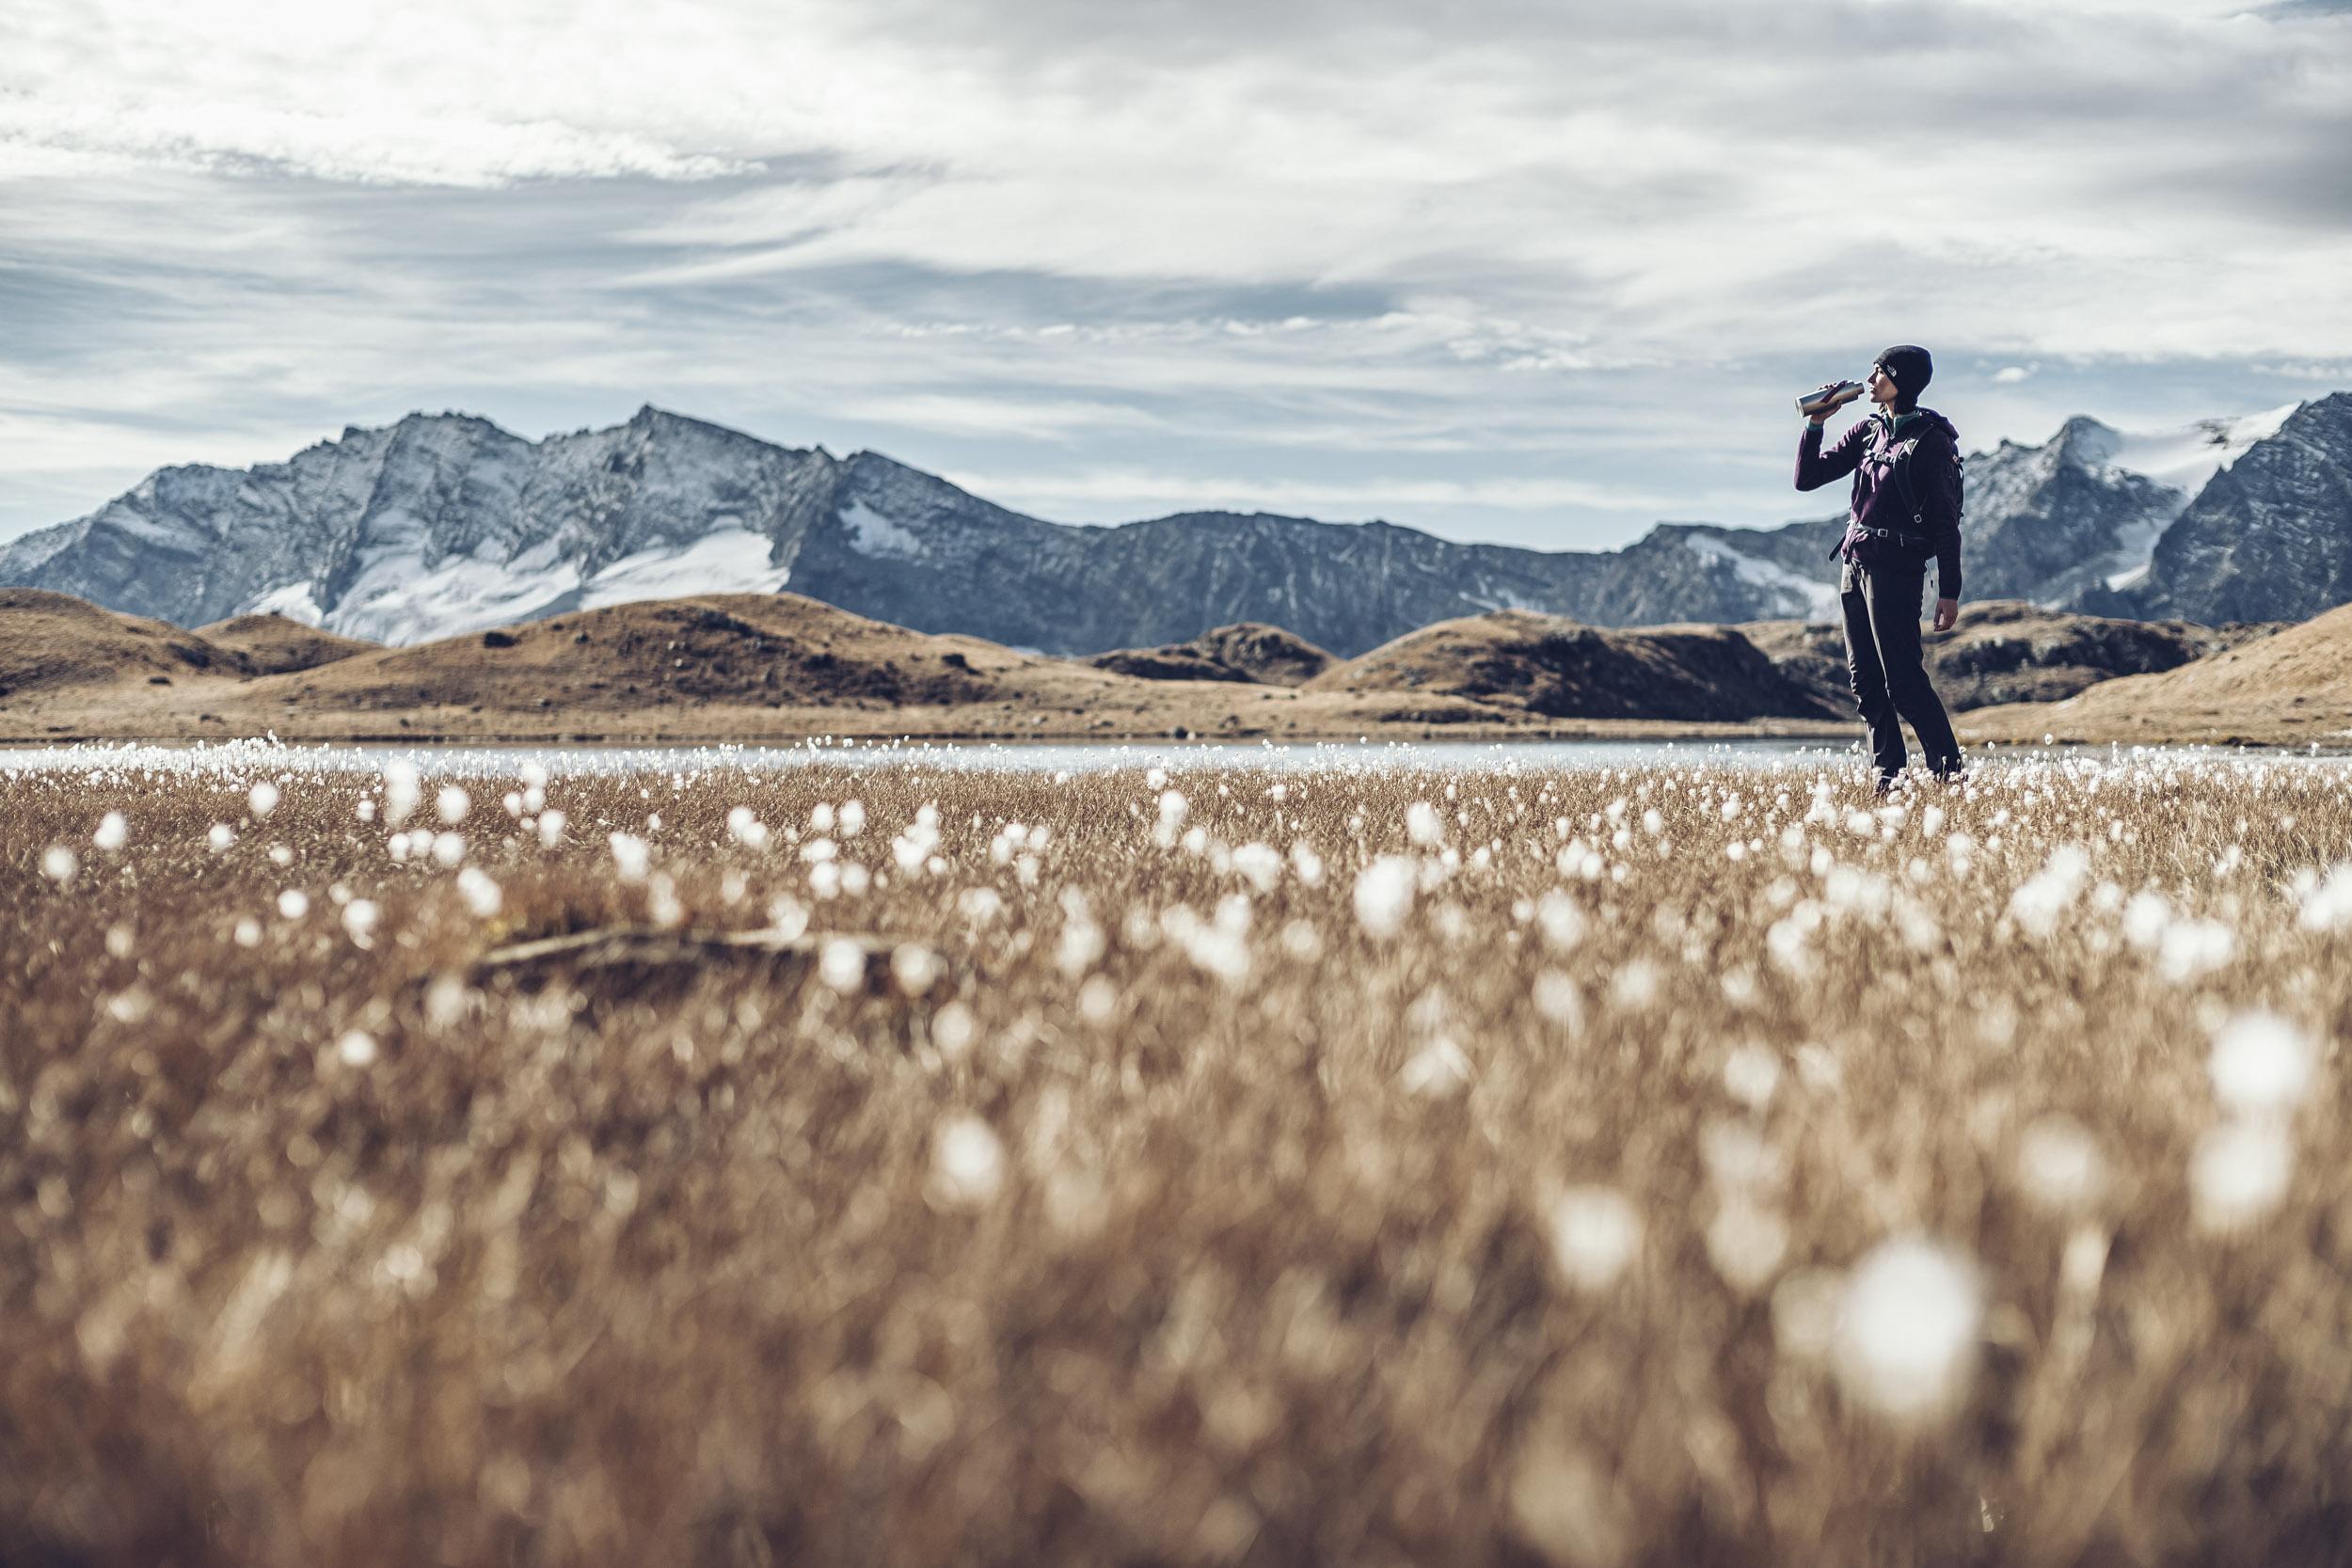 2019-SeifertUebler-luqel-outdoor-mountain-lifestyle005.jpg